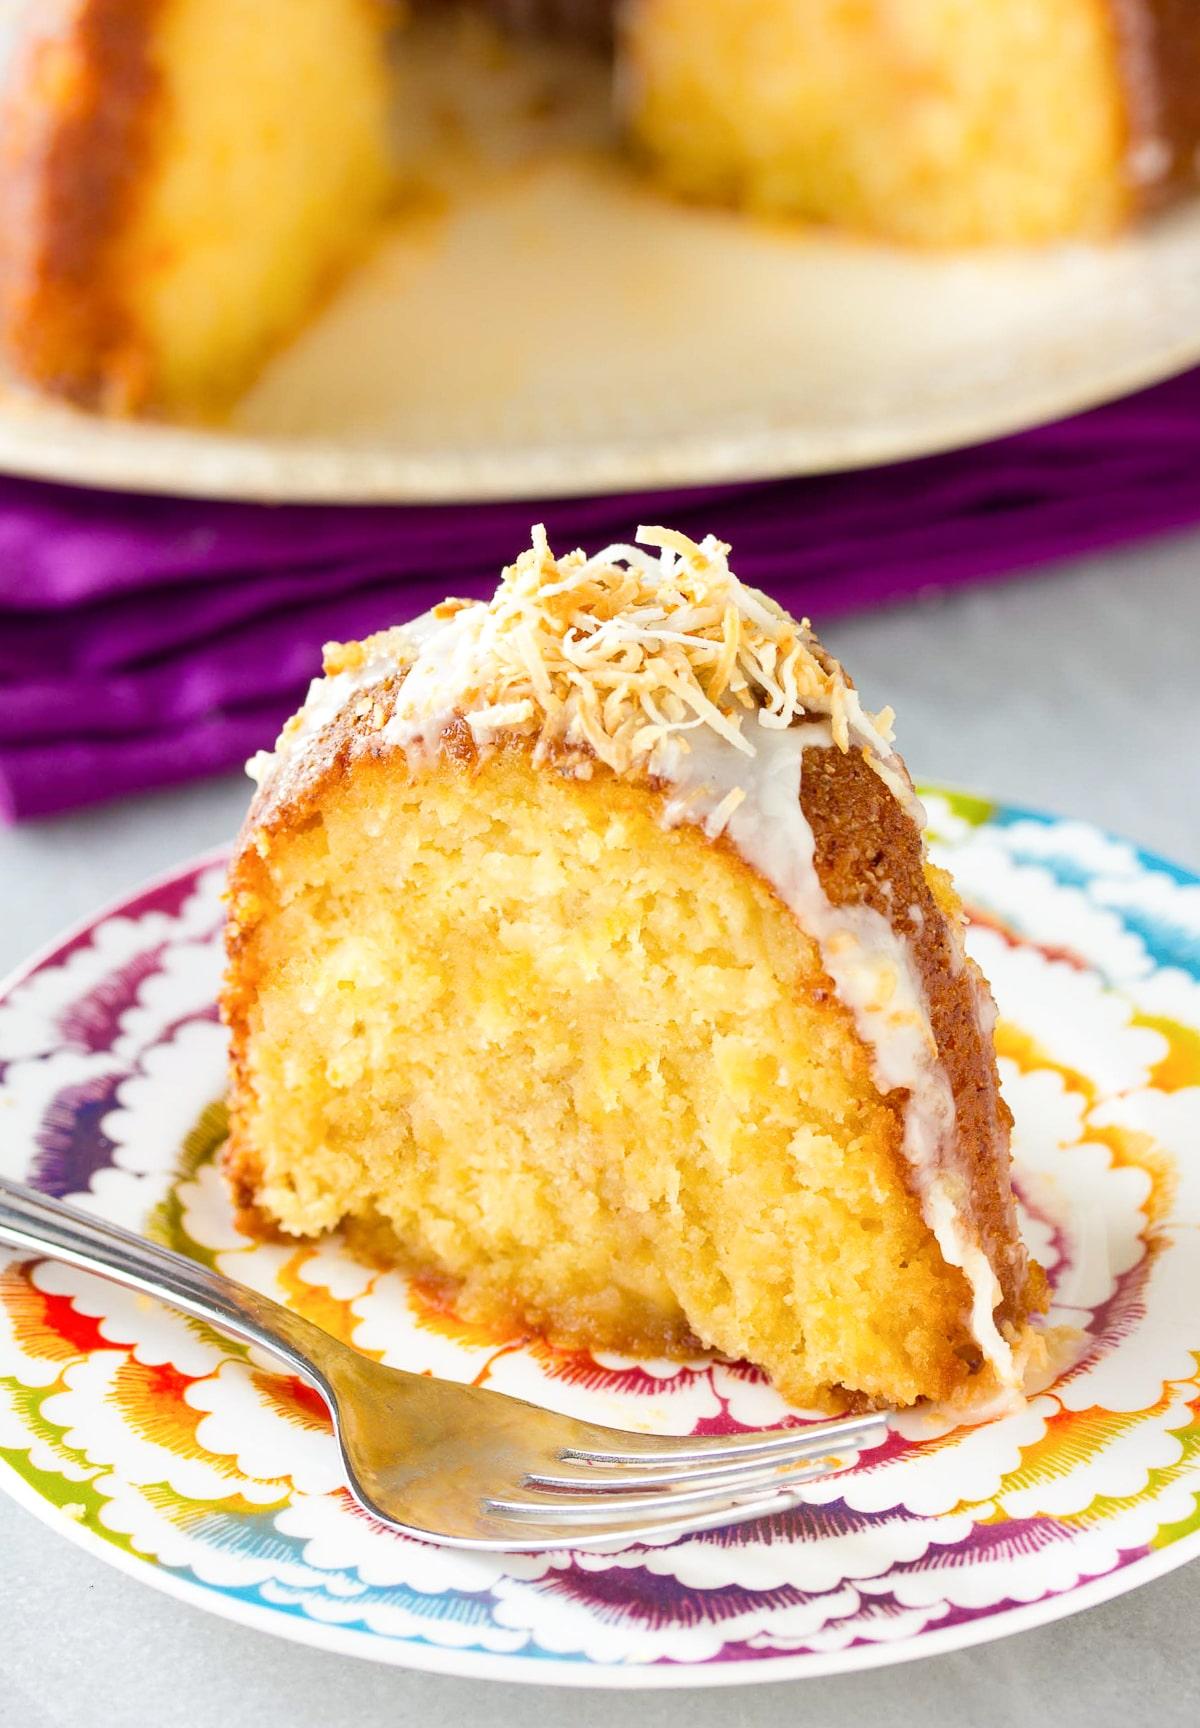 Spiced Caribbean Rum Cake Recipe #ASpicyPerspective #bundtcake #spicecake #rum #rumcake #caribbean #holiday #coconut #pineapple